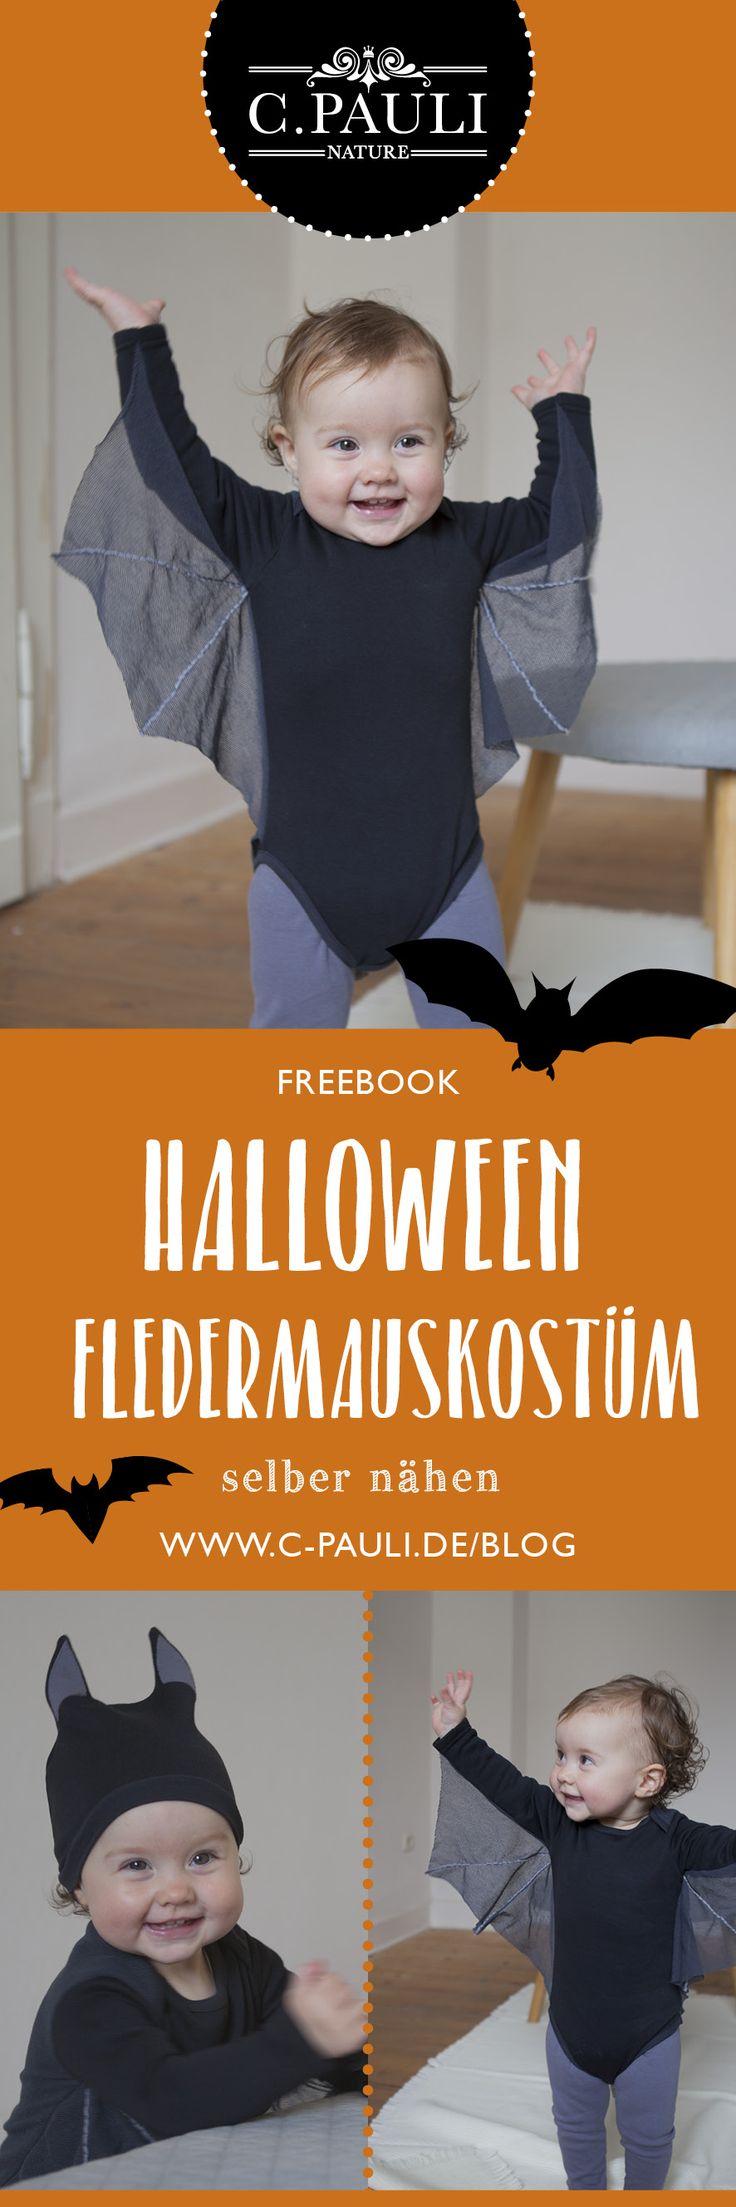 Baby-Halloweenkostüm Fledermaus – Schnittmuster und Tutorial | C.Pauli Nature Blog